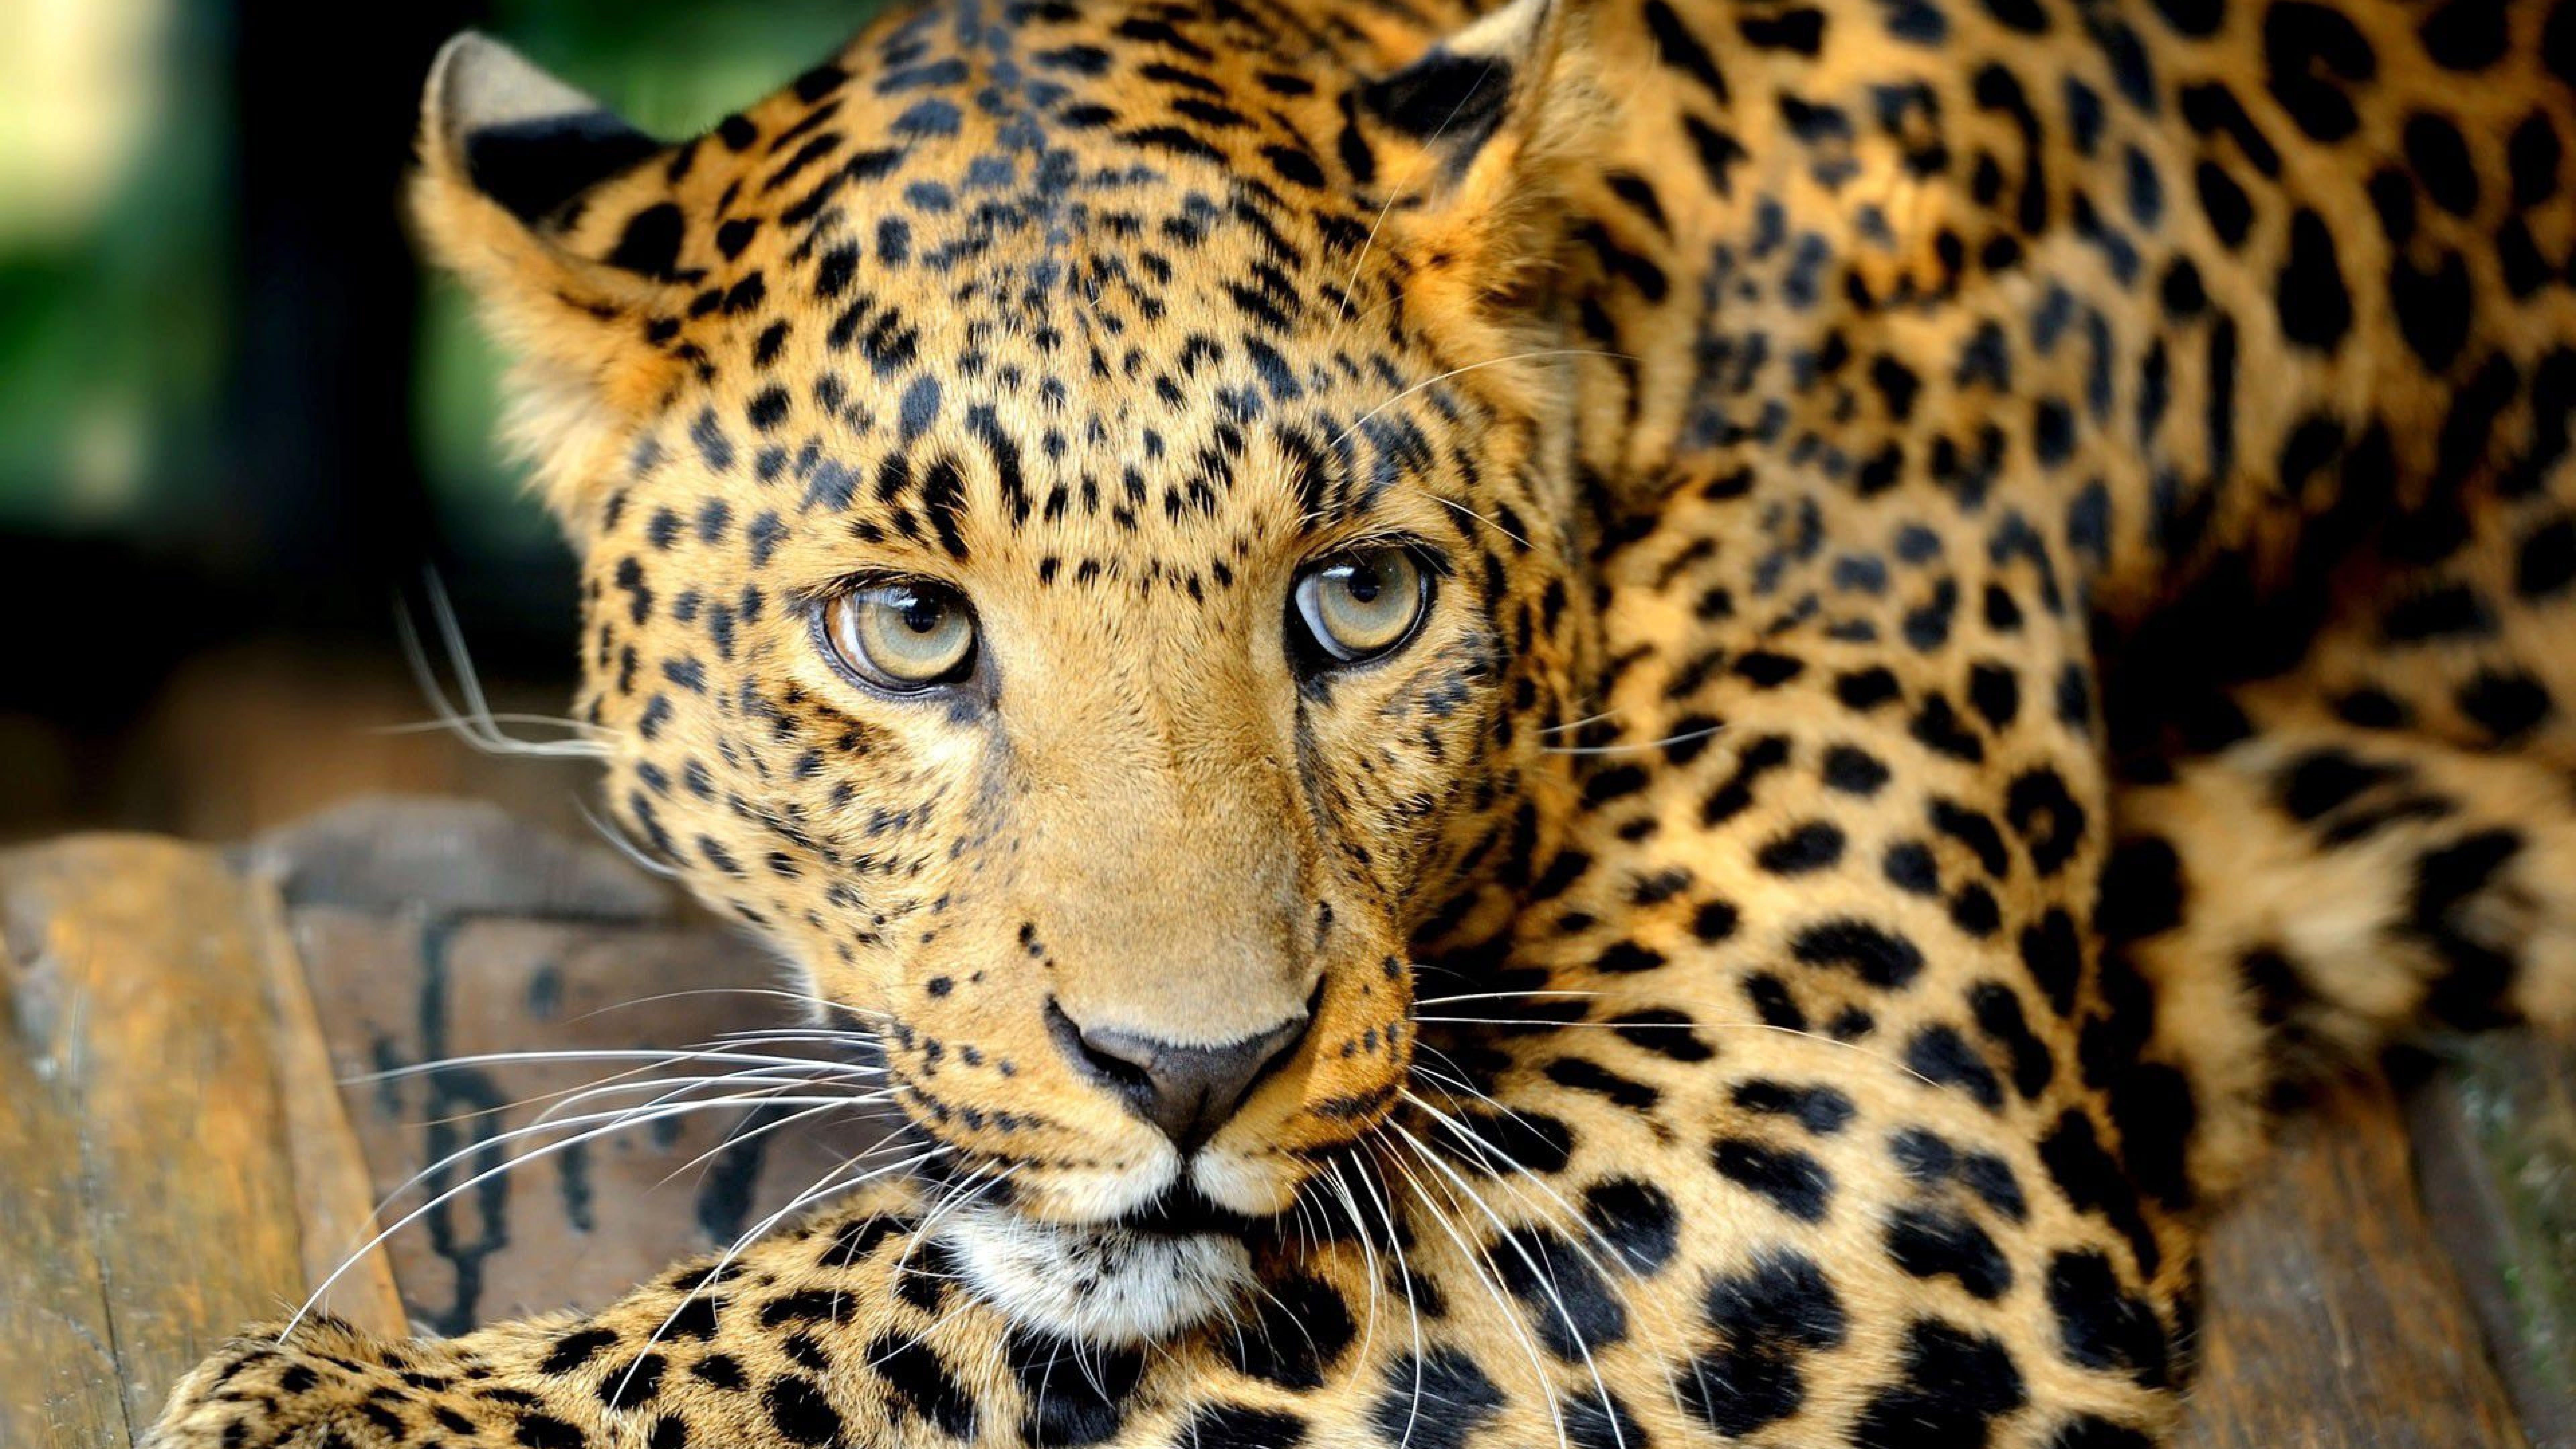 8k Animal Wallpaper Download: 8K Tiger UHD Wallpapers